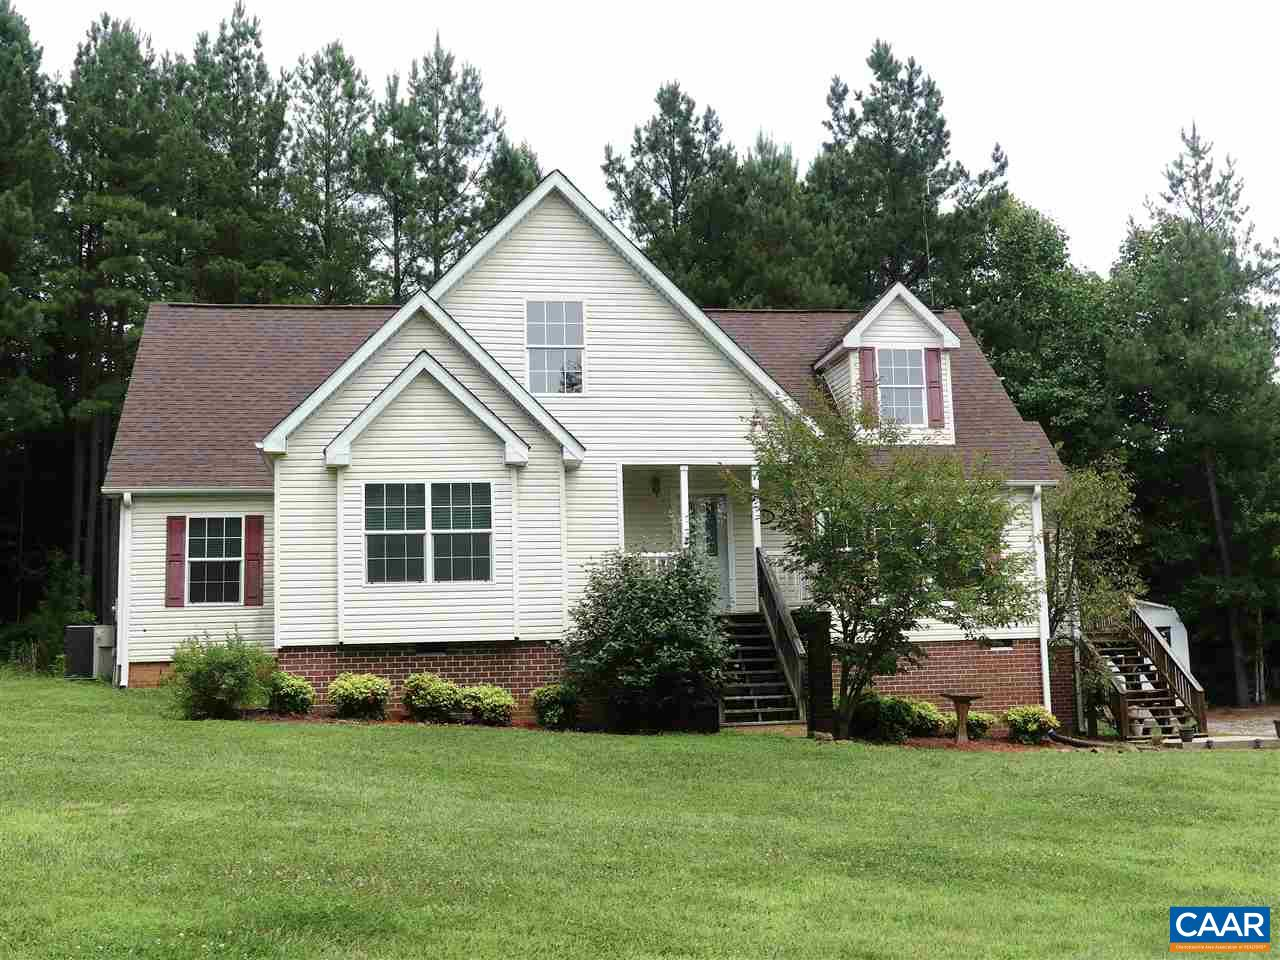 190 CARRIAGE HILL RD, FARMVILLE, VA 23901